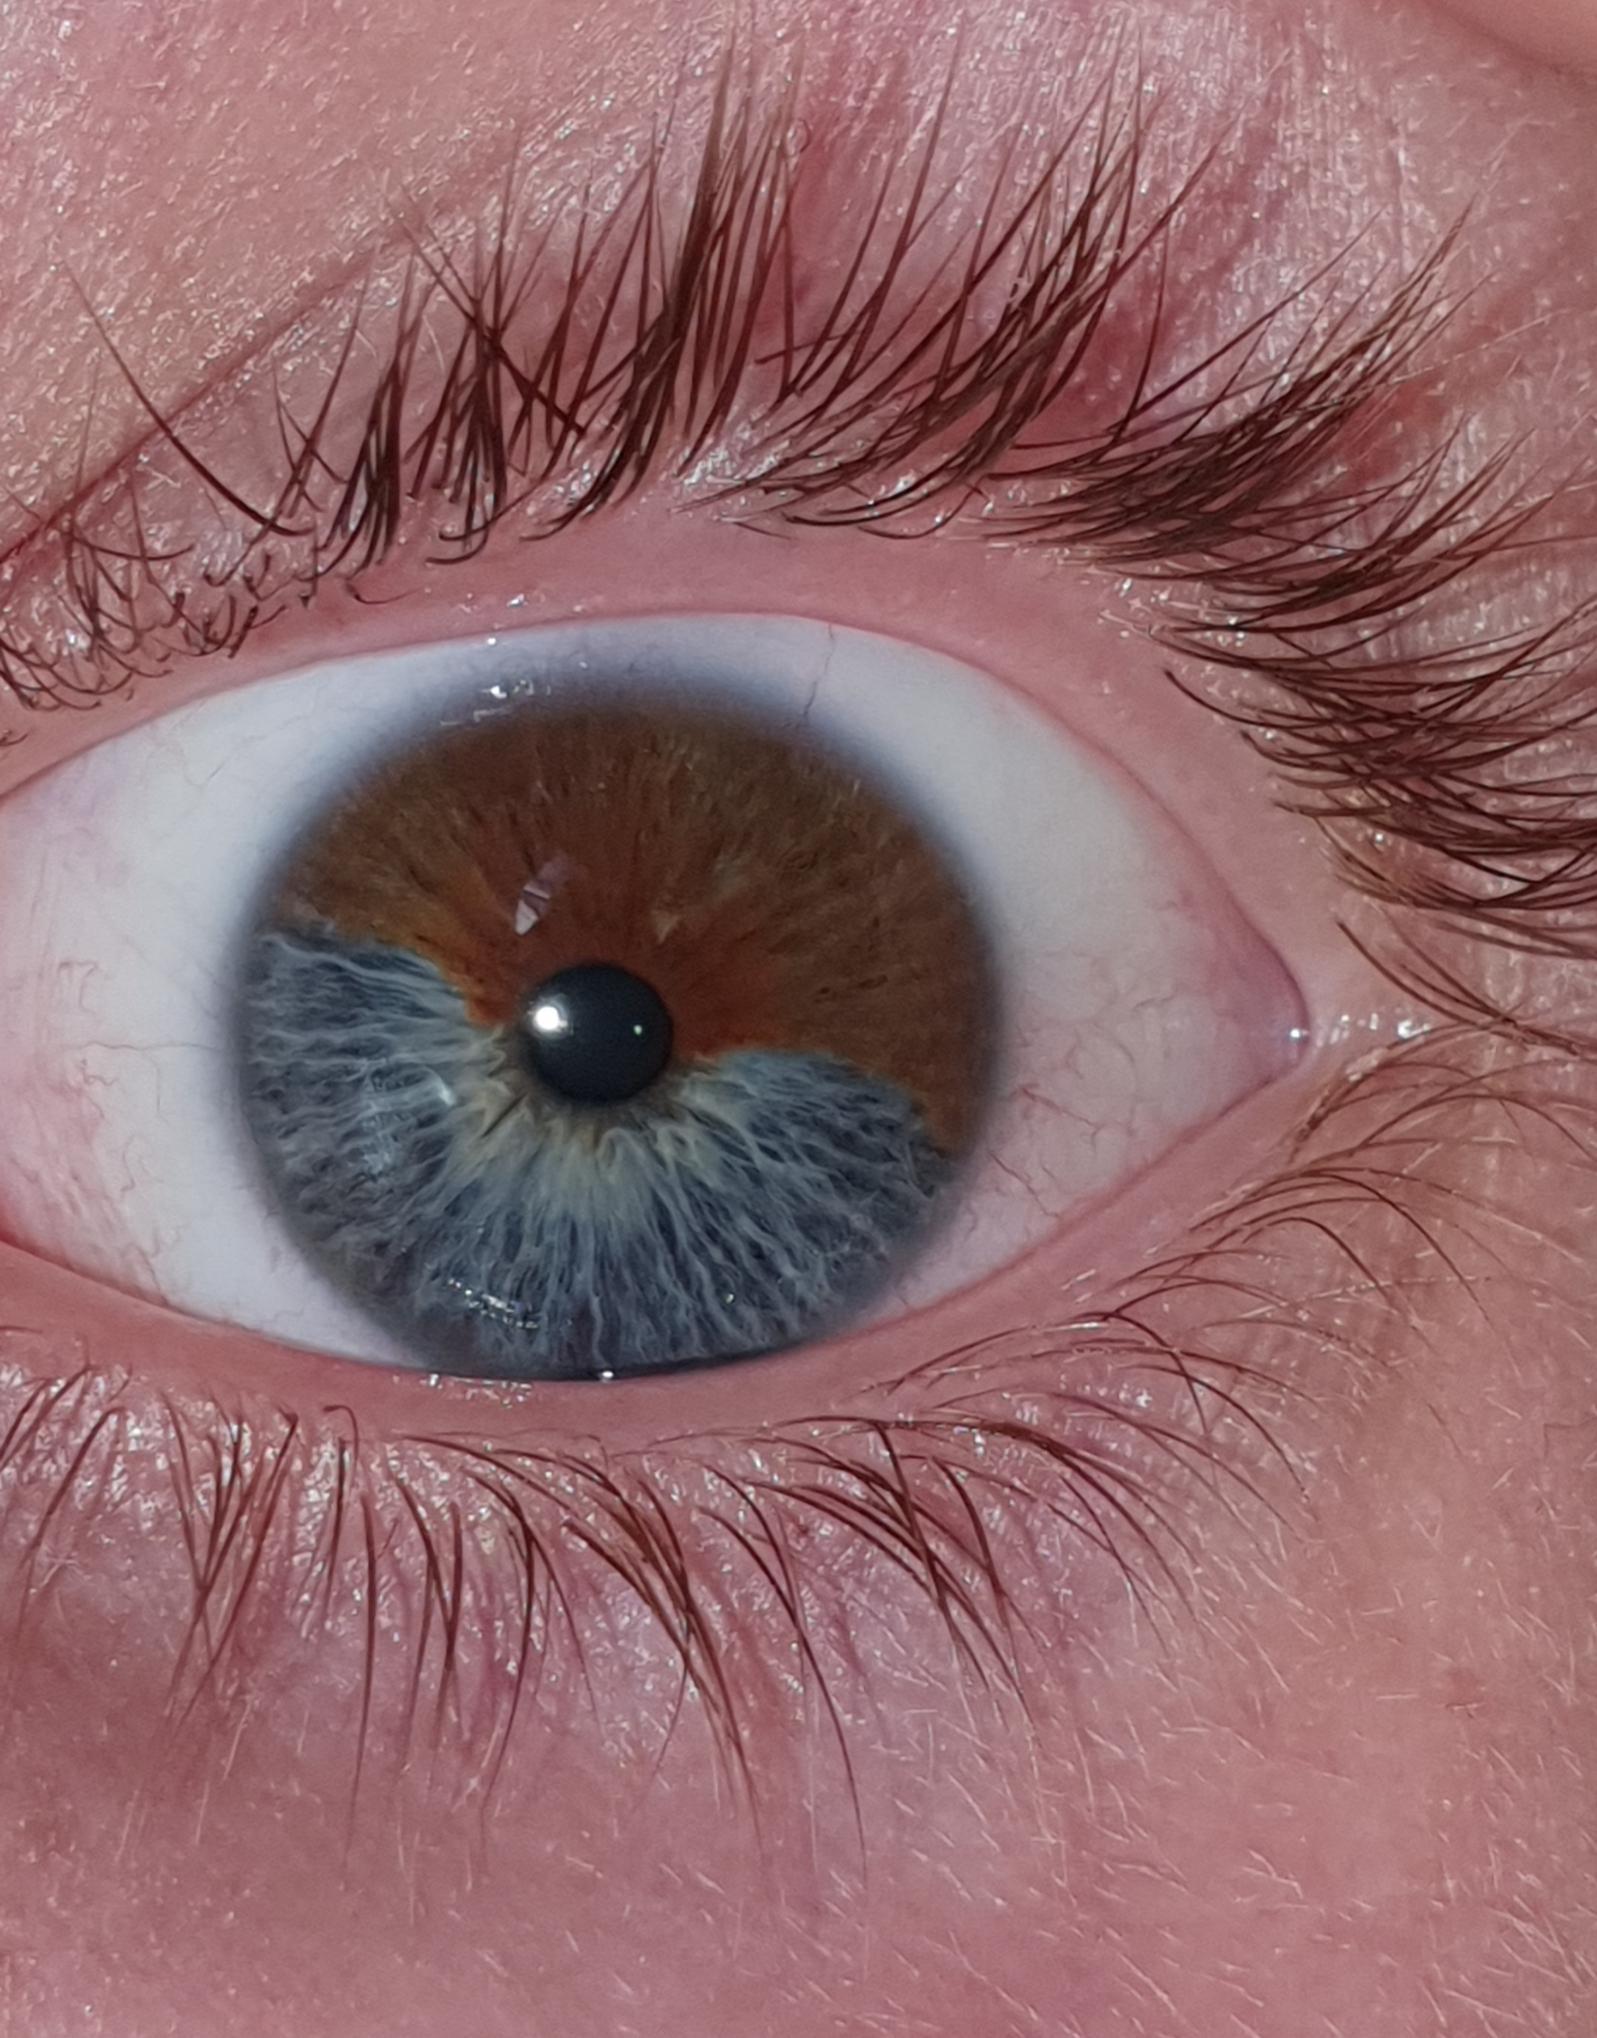 My Eye Has 2 Different Colors Mildlyinteresting